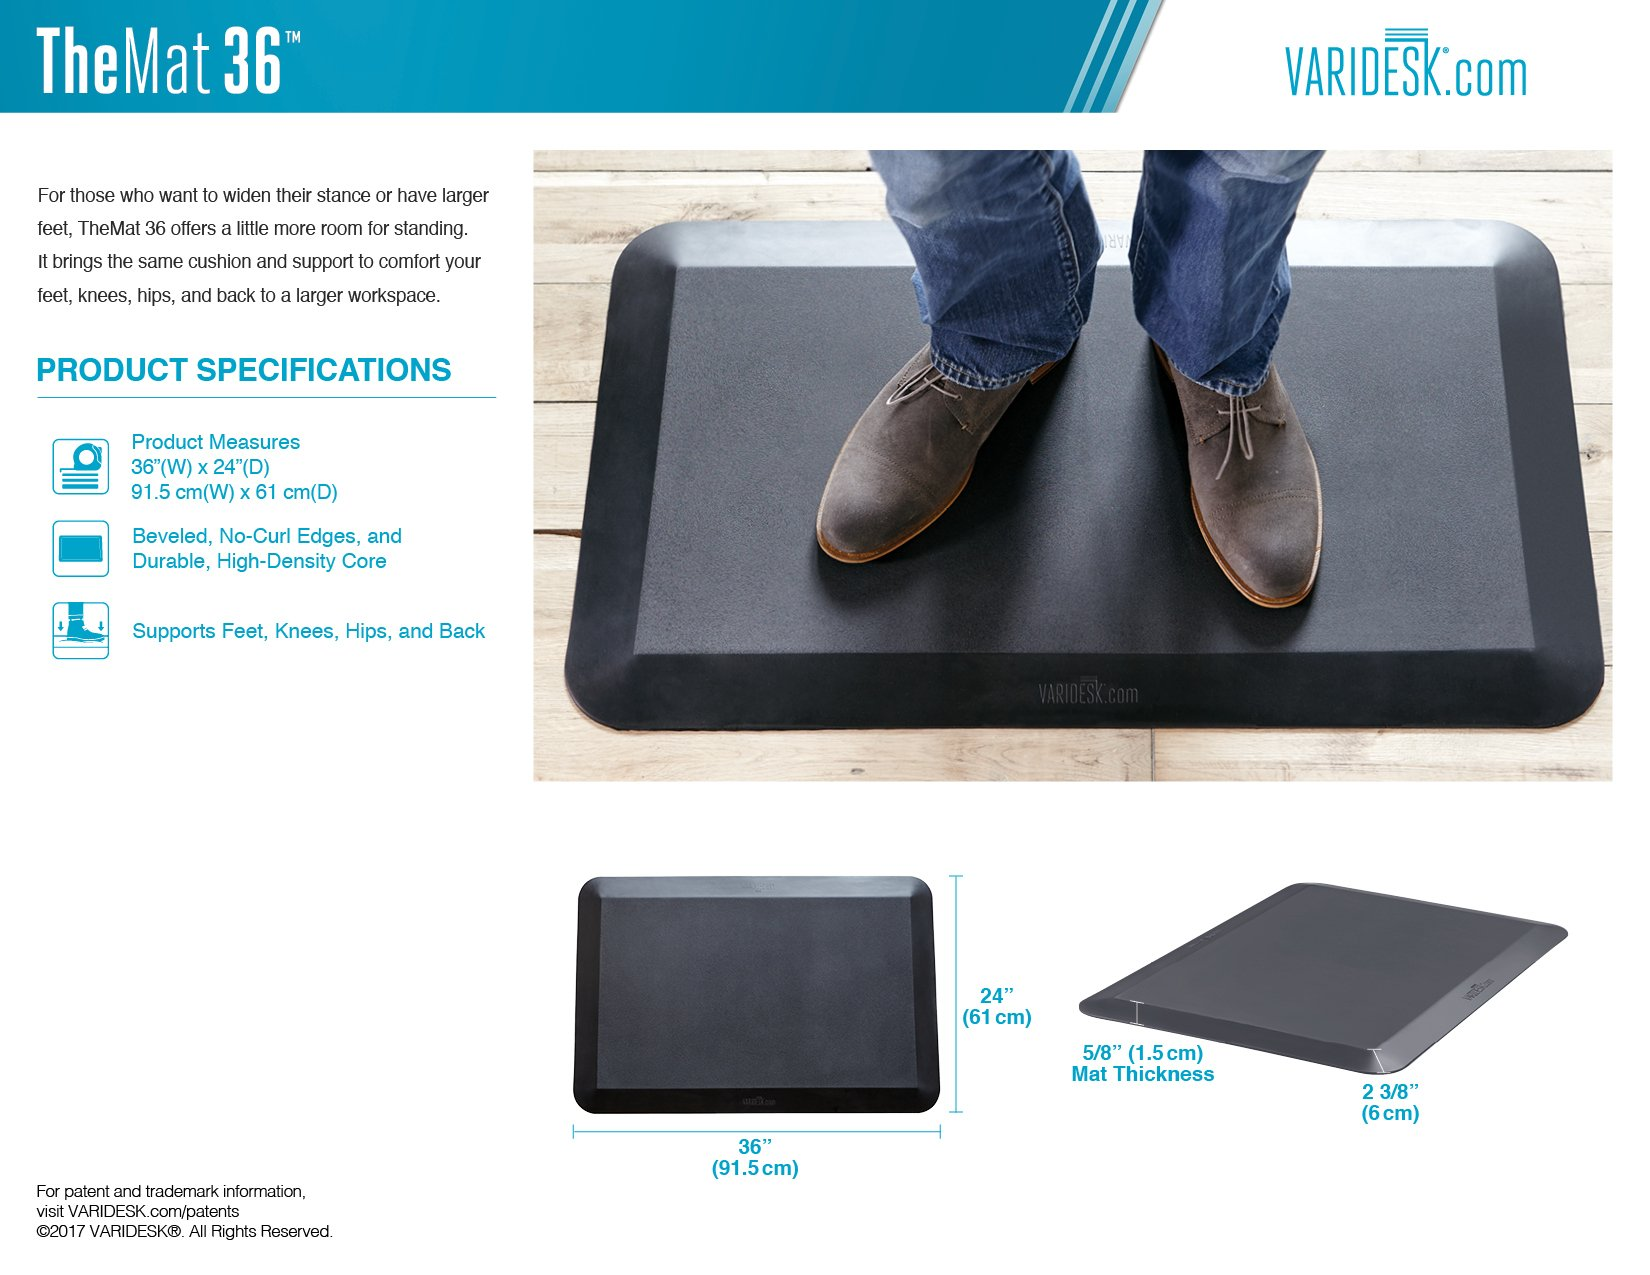 VARIDESK-Standing Desk Anti-Fatigue Comfort Floor Mat - Mat 36 by VARIDESK